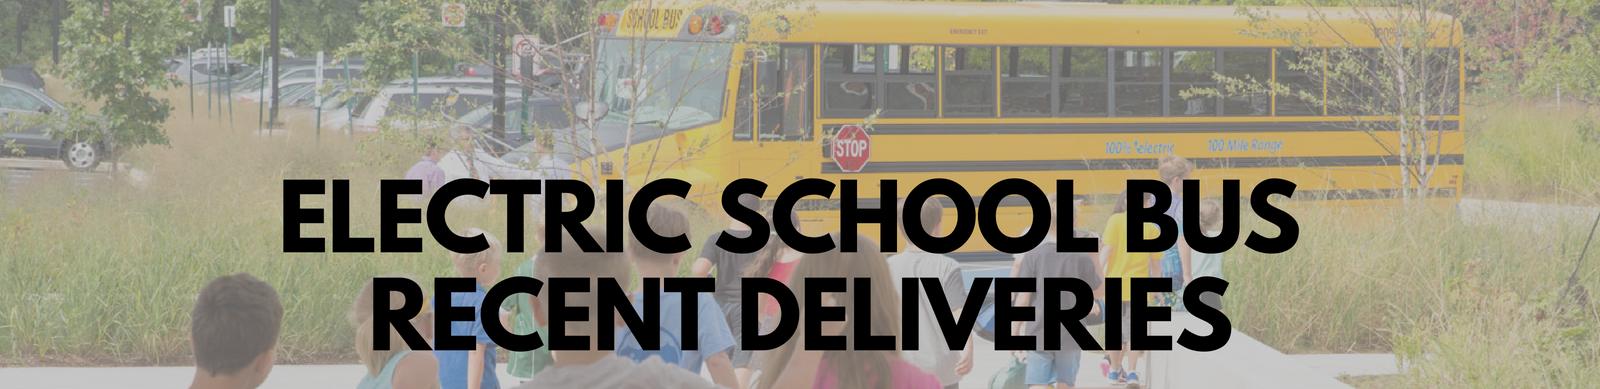 Electric School Buses